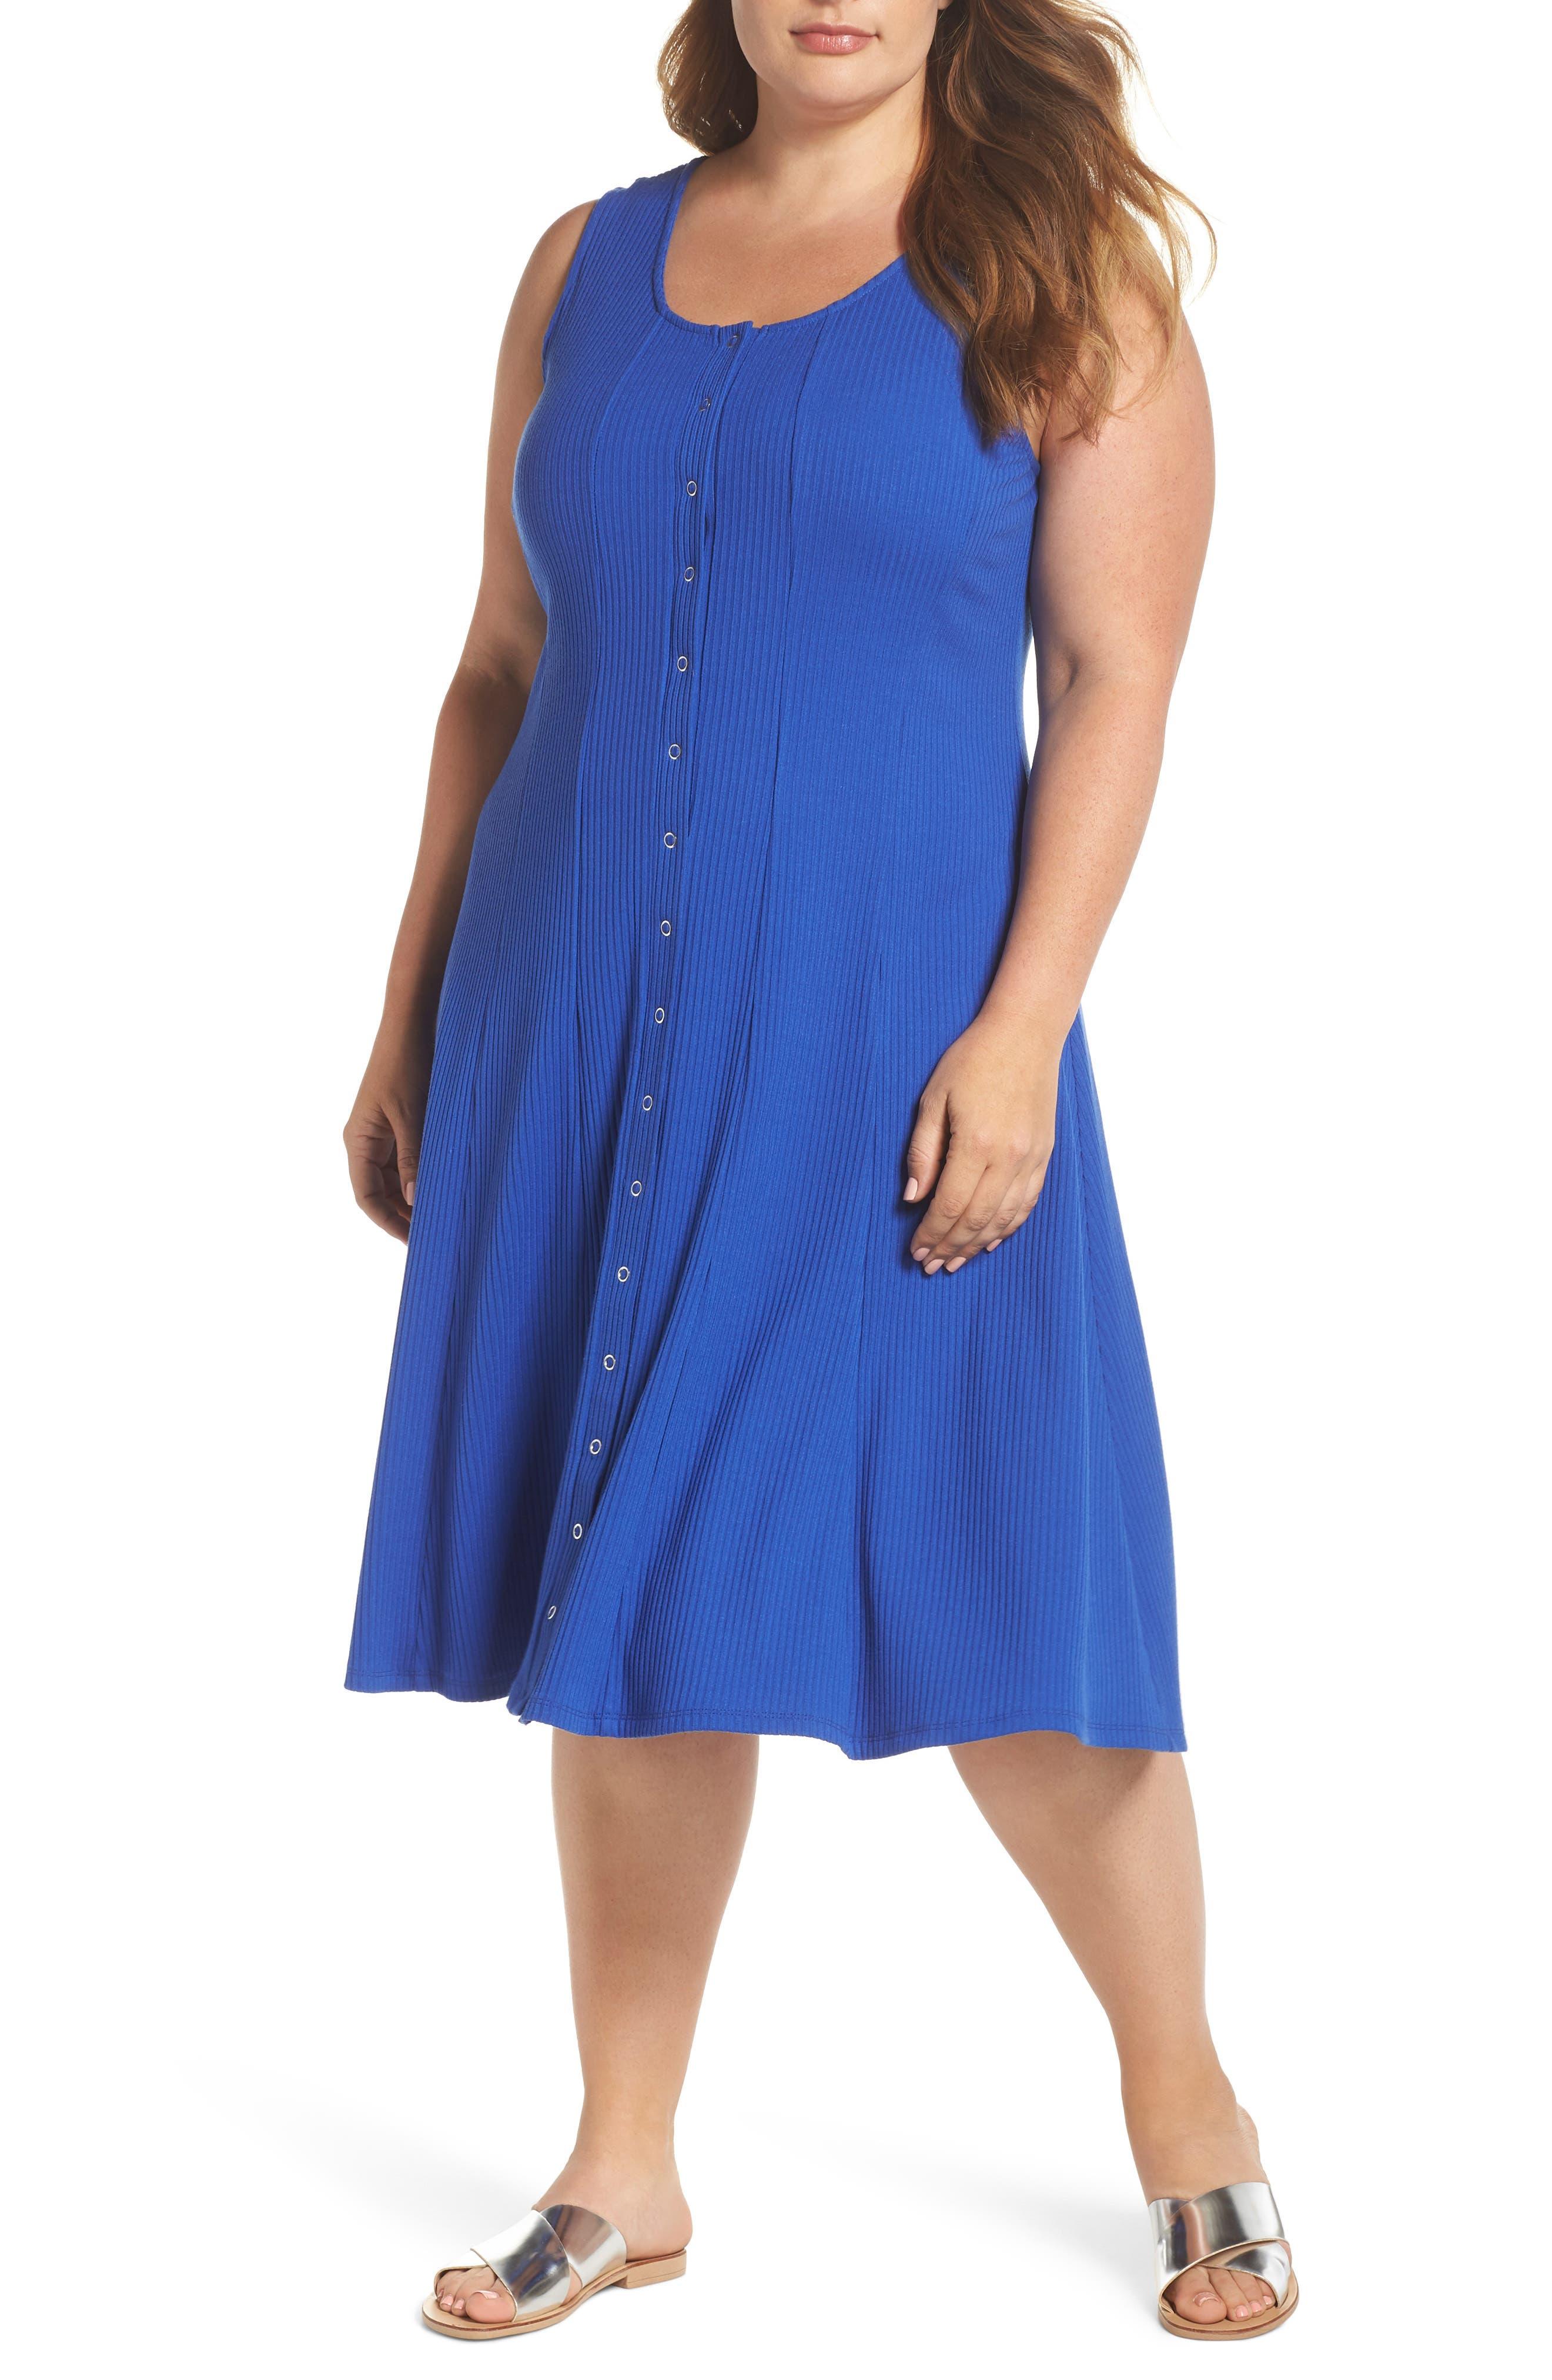 Rib Tank Dress,                         Main,                         color, 424